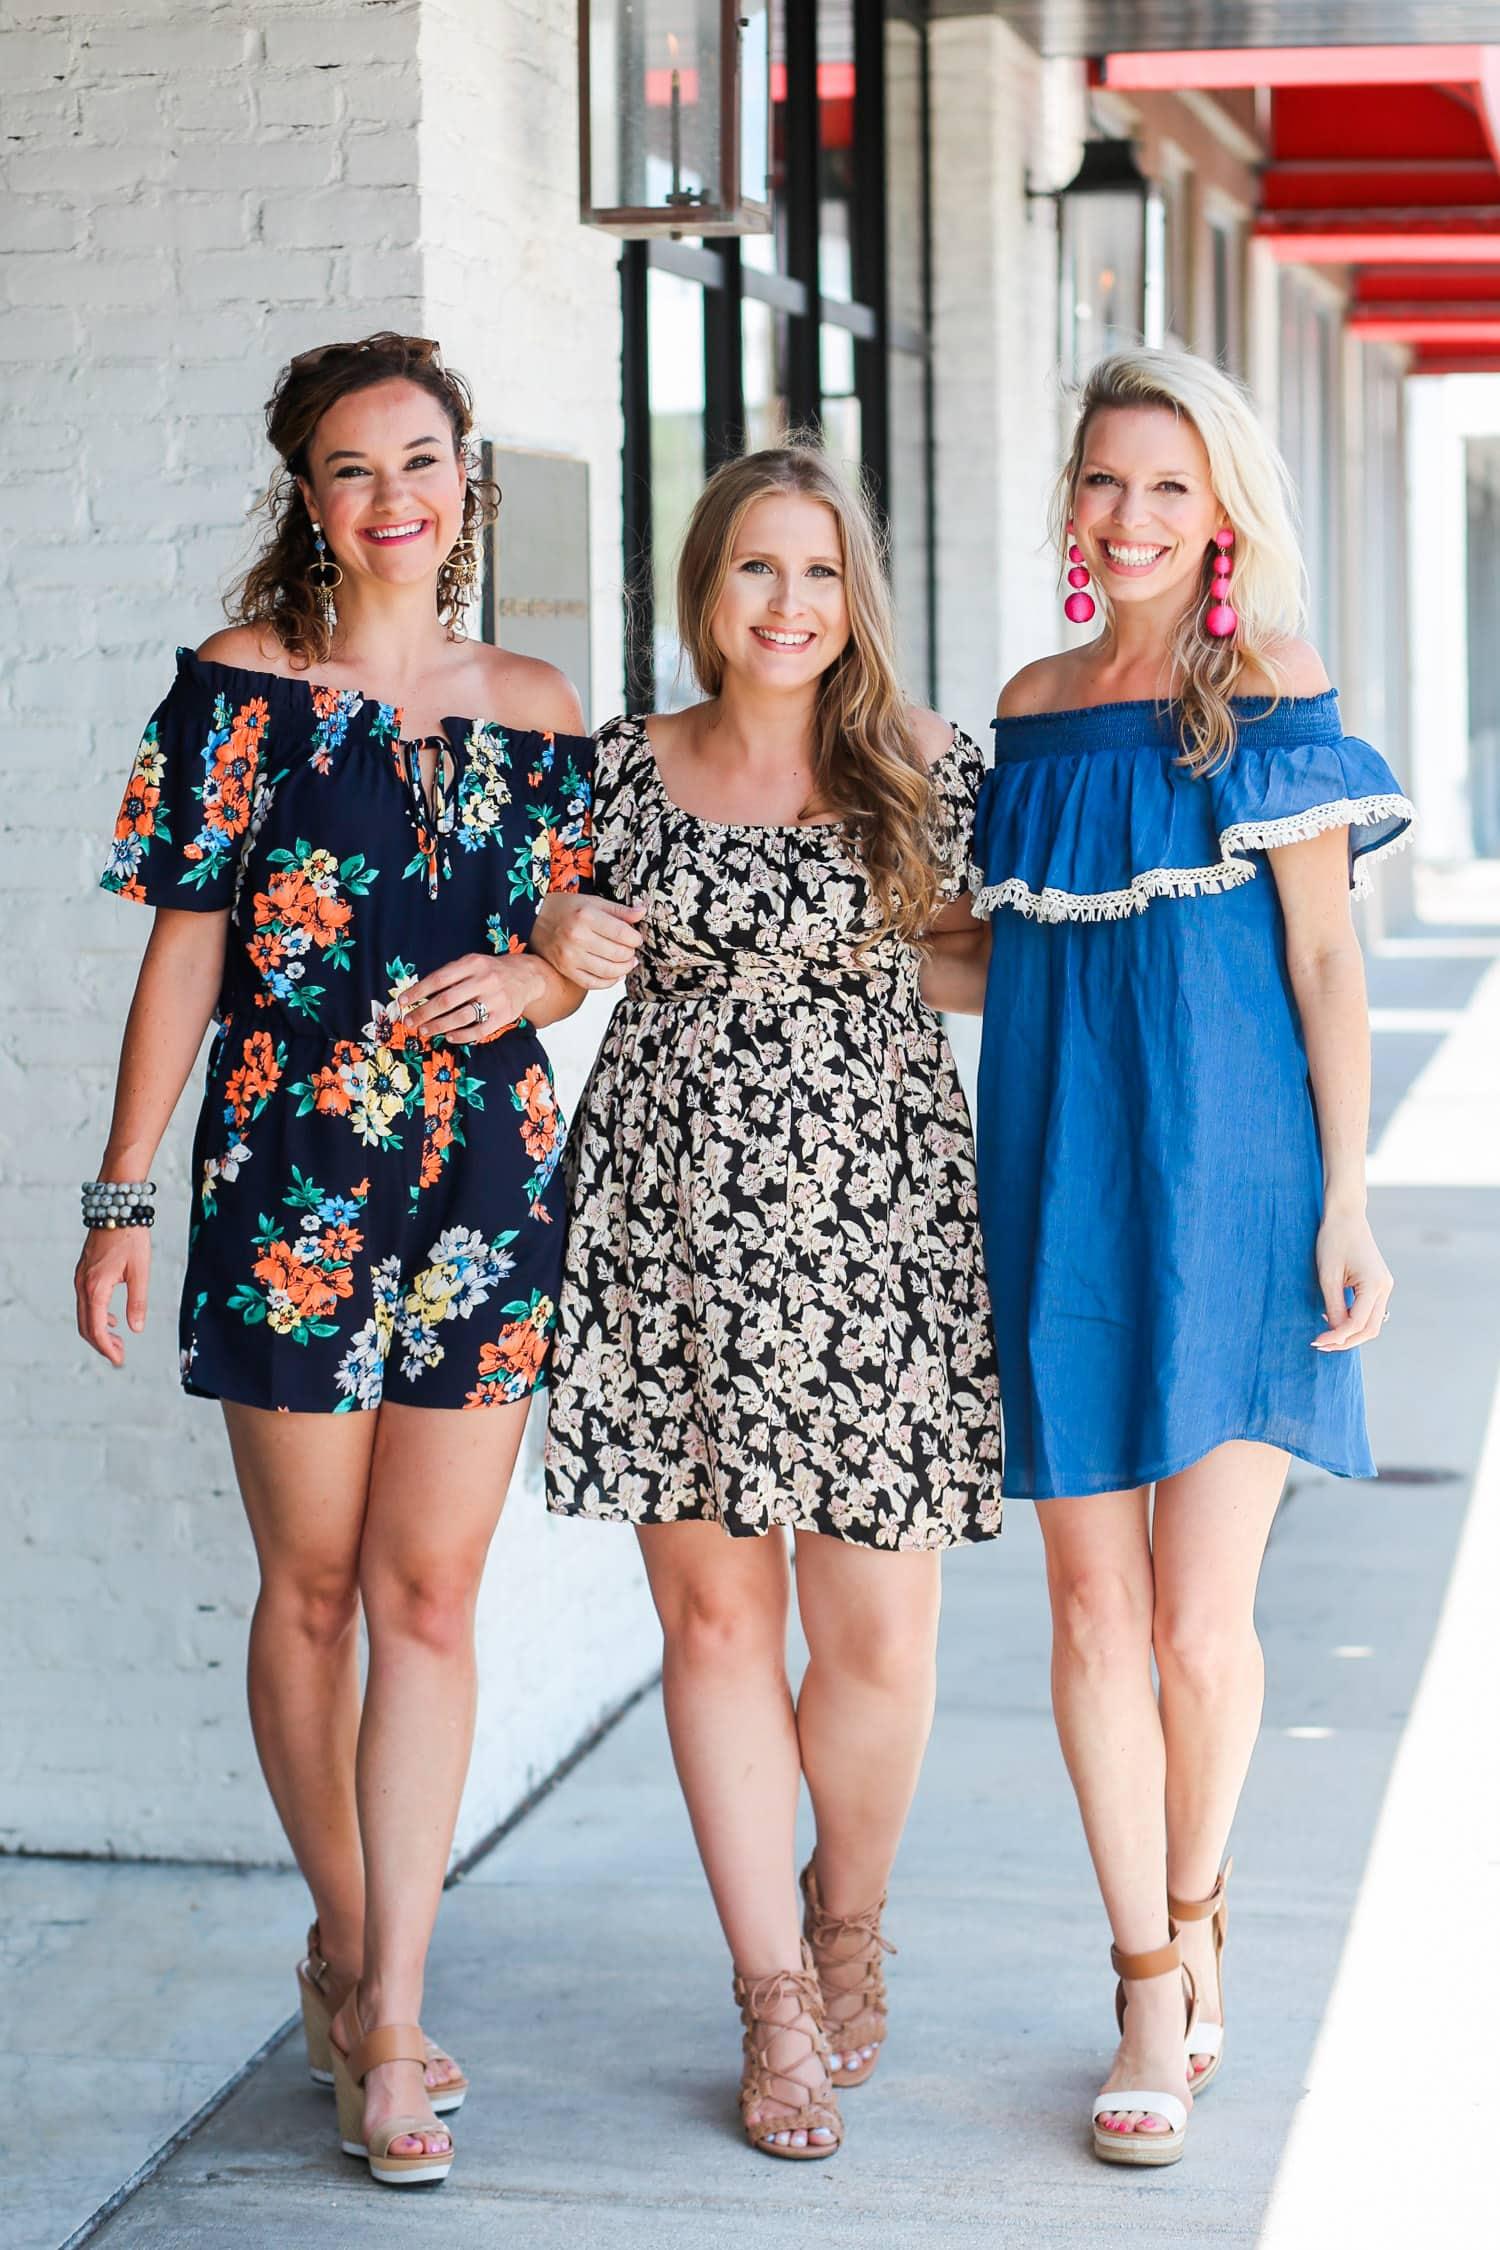 Orlando and Tampa fashion bloggers: So Sarah Hunt, My Life Well Loved, Ashley Brooke Nicholas